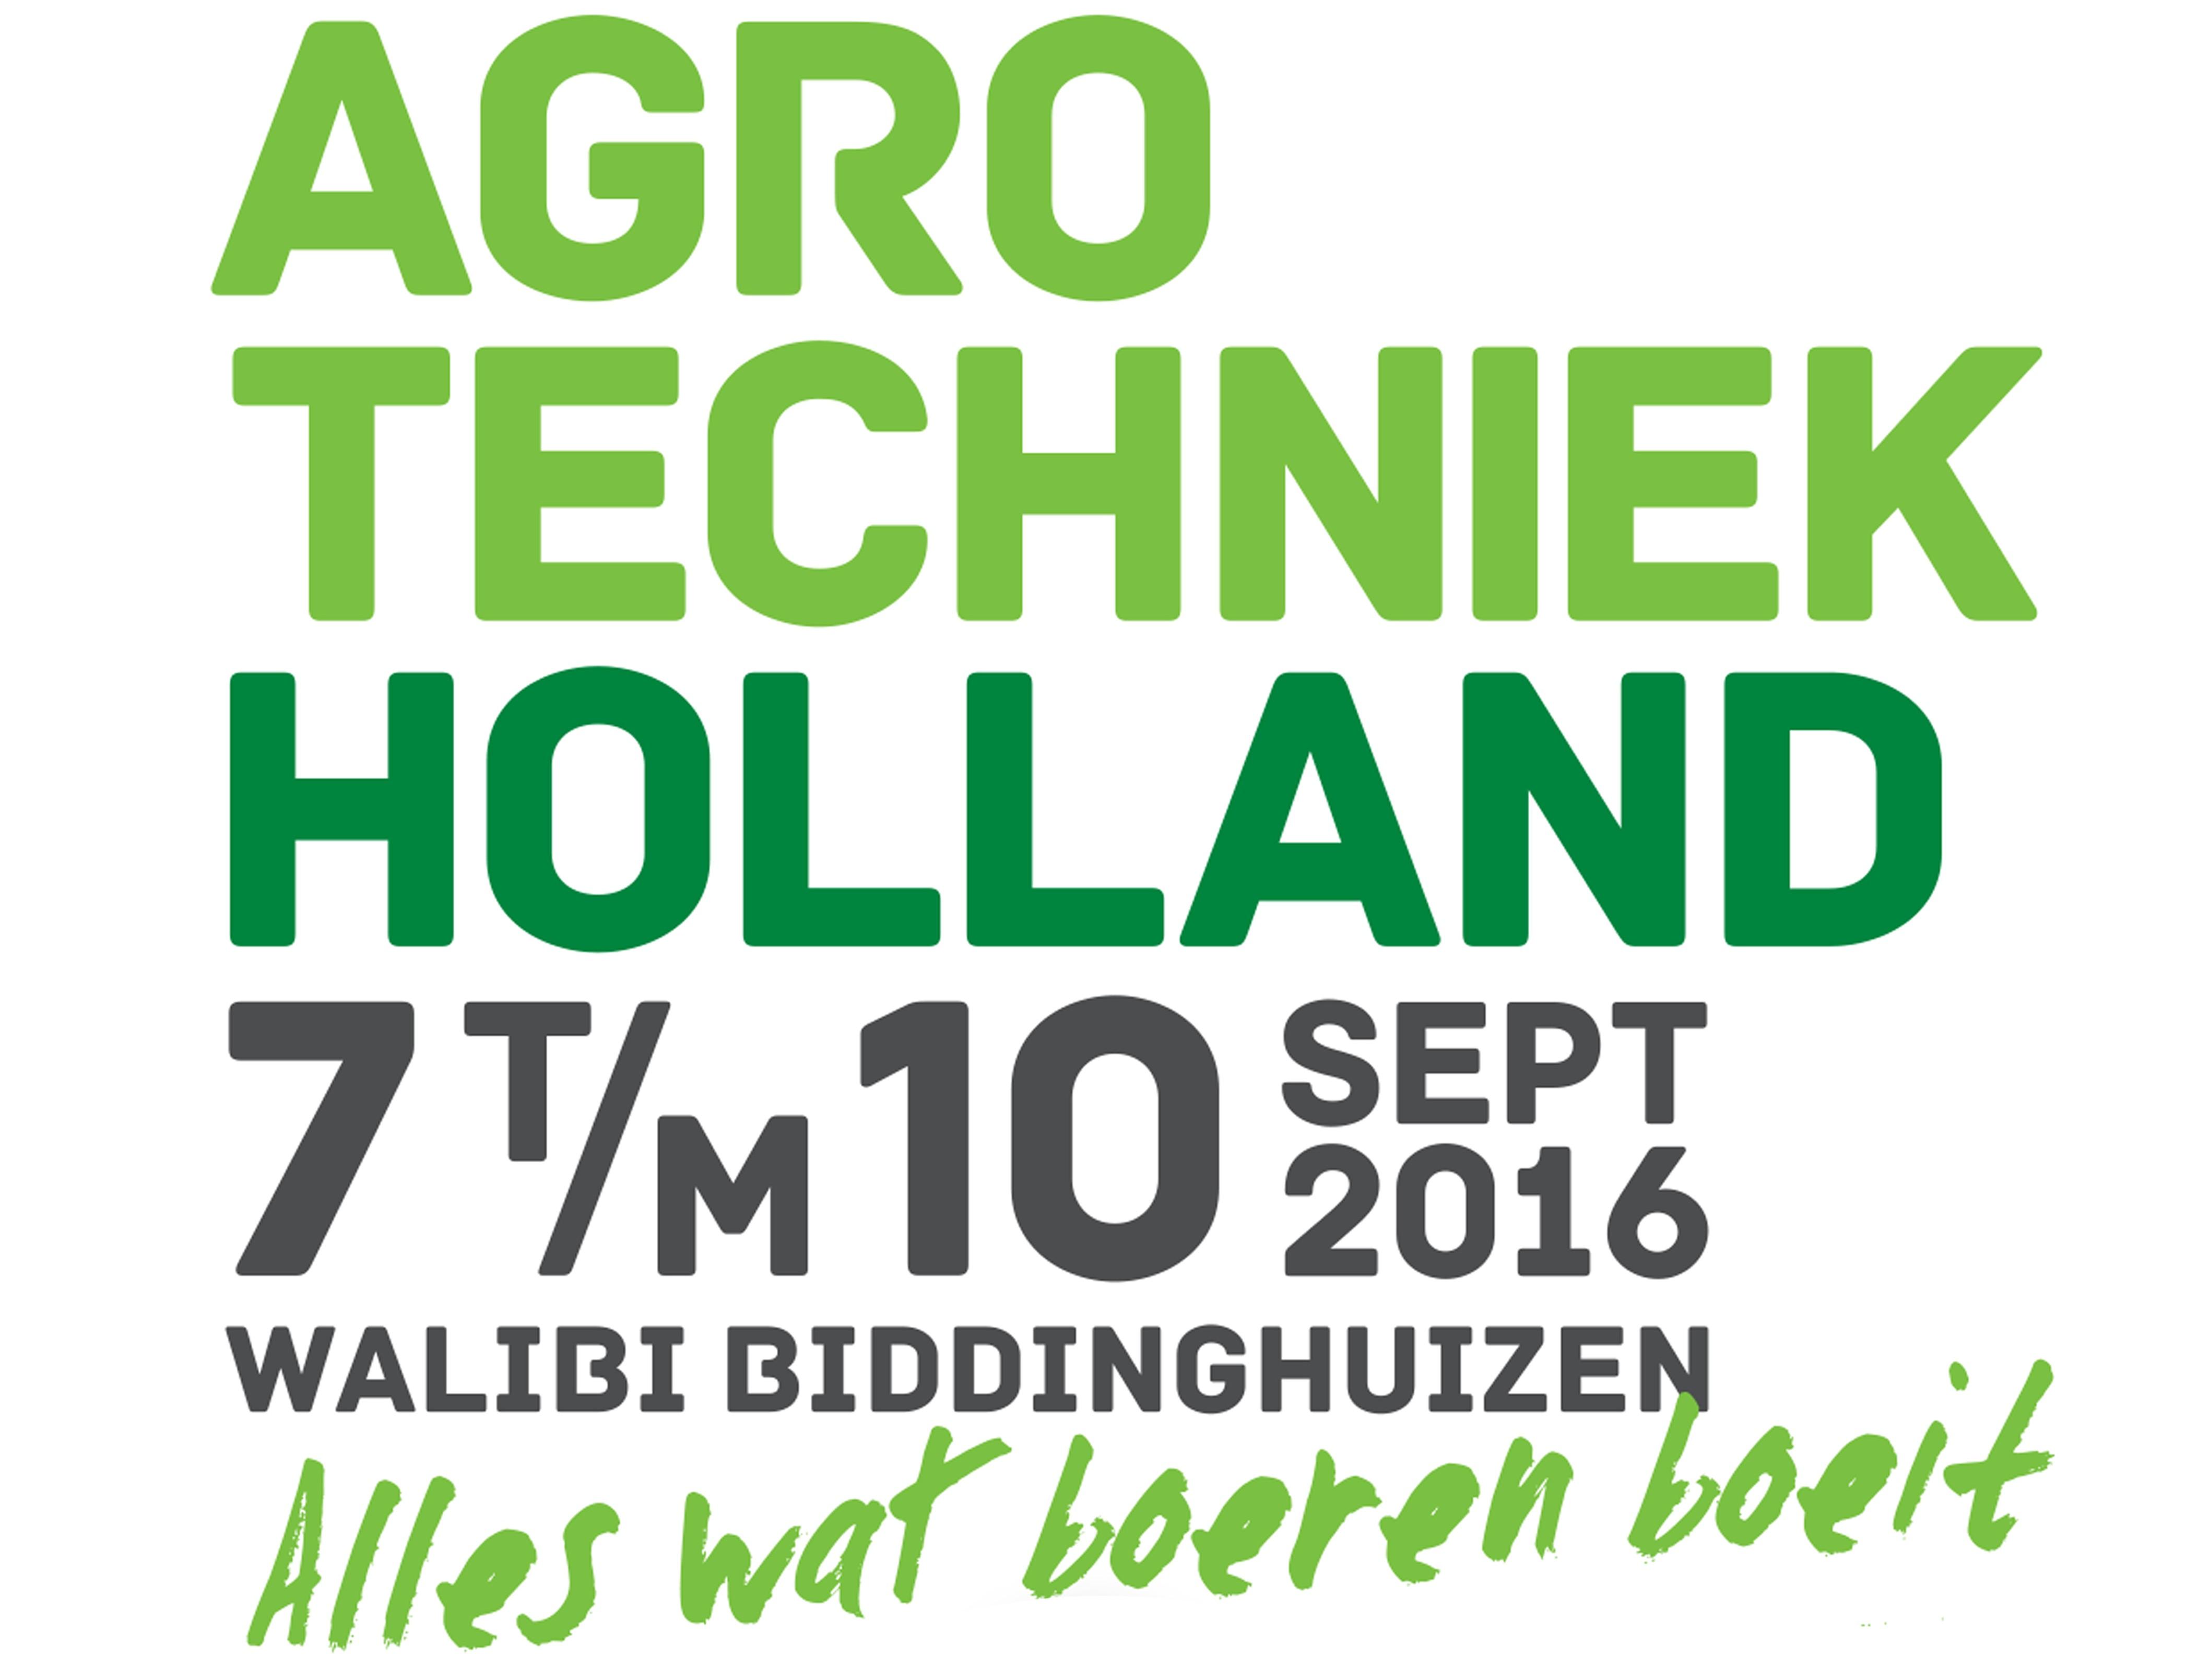 AgroTechniek Holland 2016